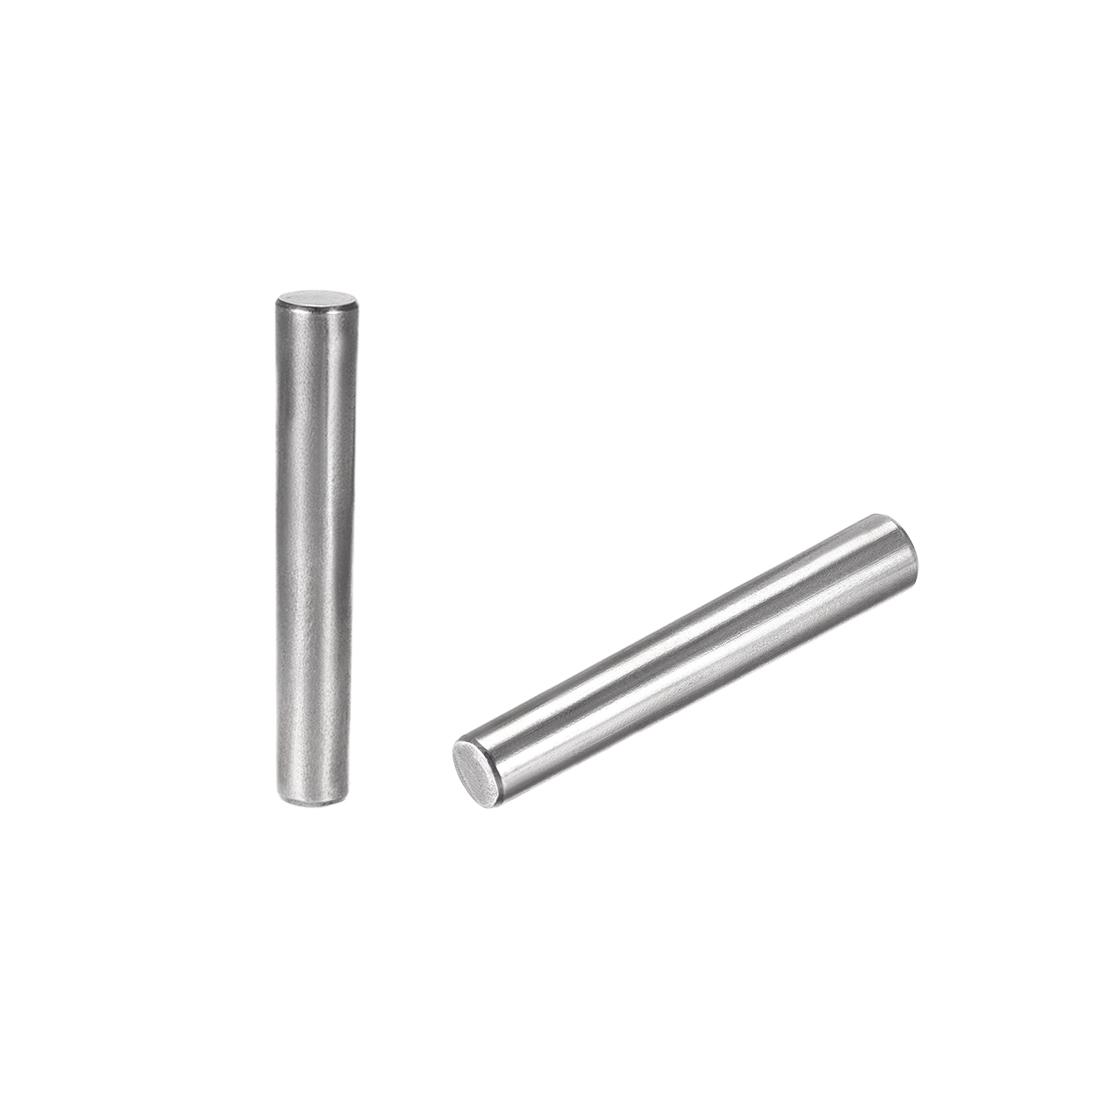 Carbon Steel GB117 70mm Length 10mm x 11.4mm Small End Diameter 1:50 5 Pcs